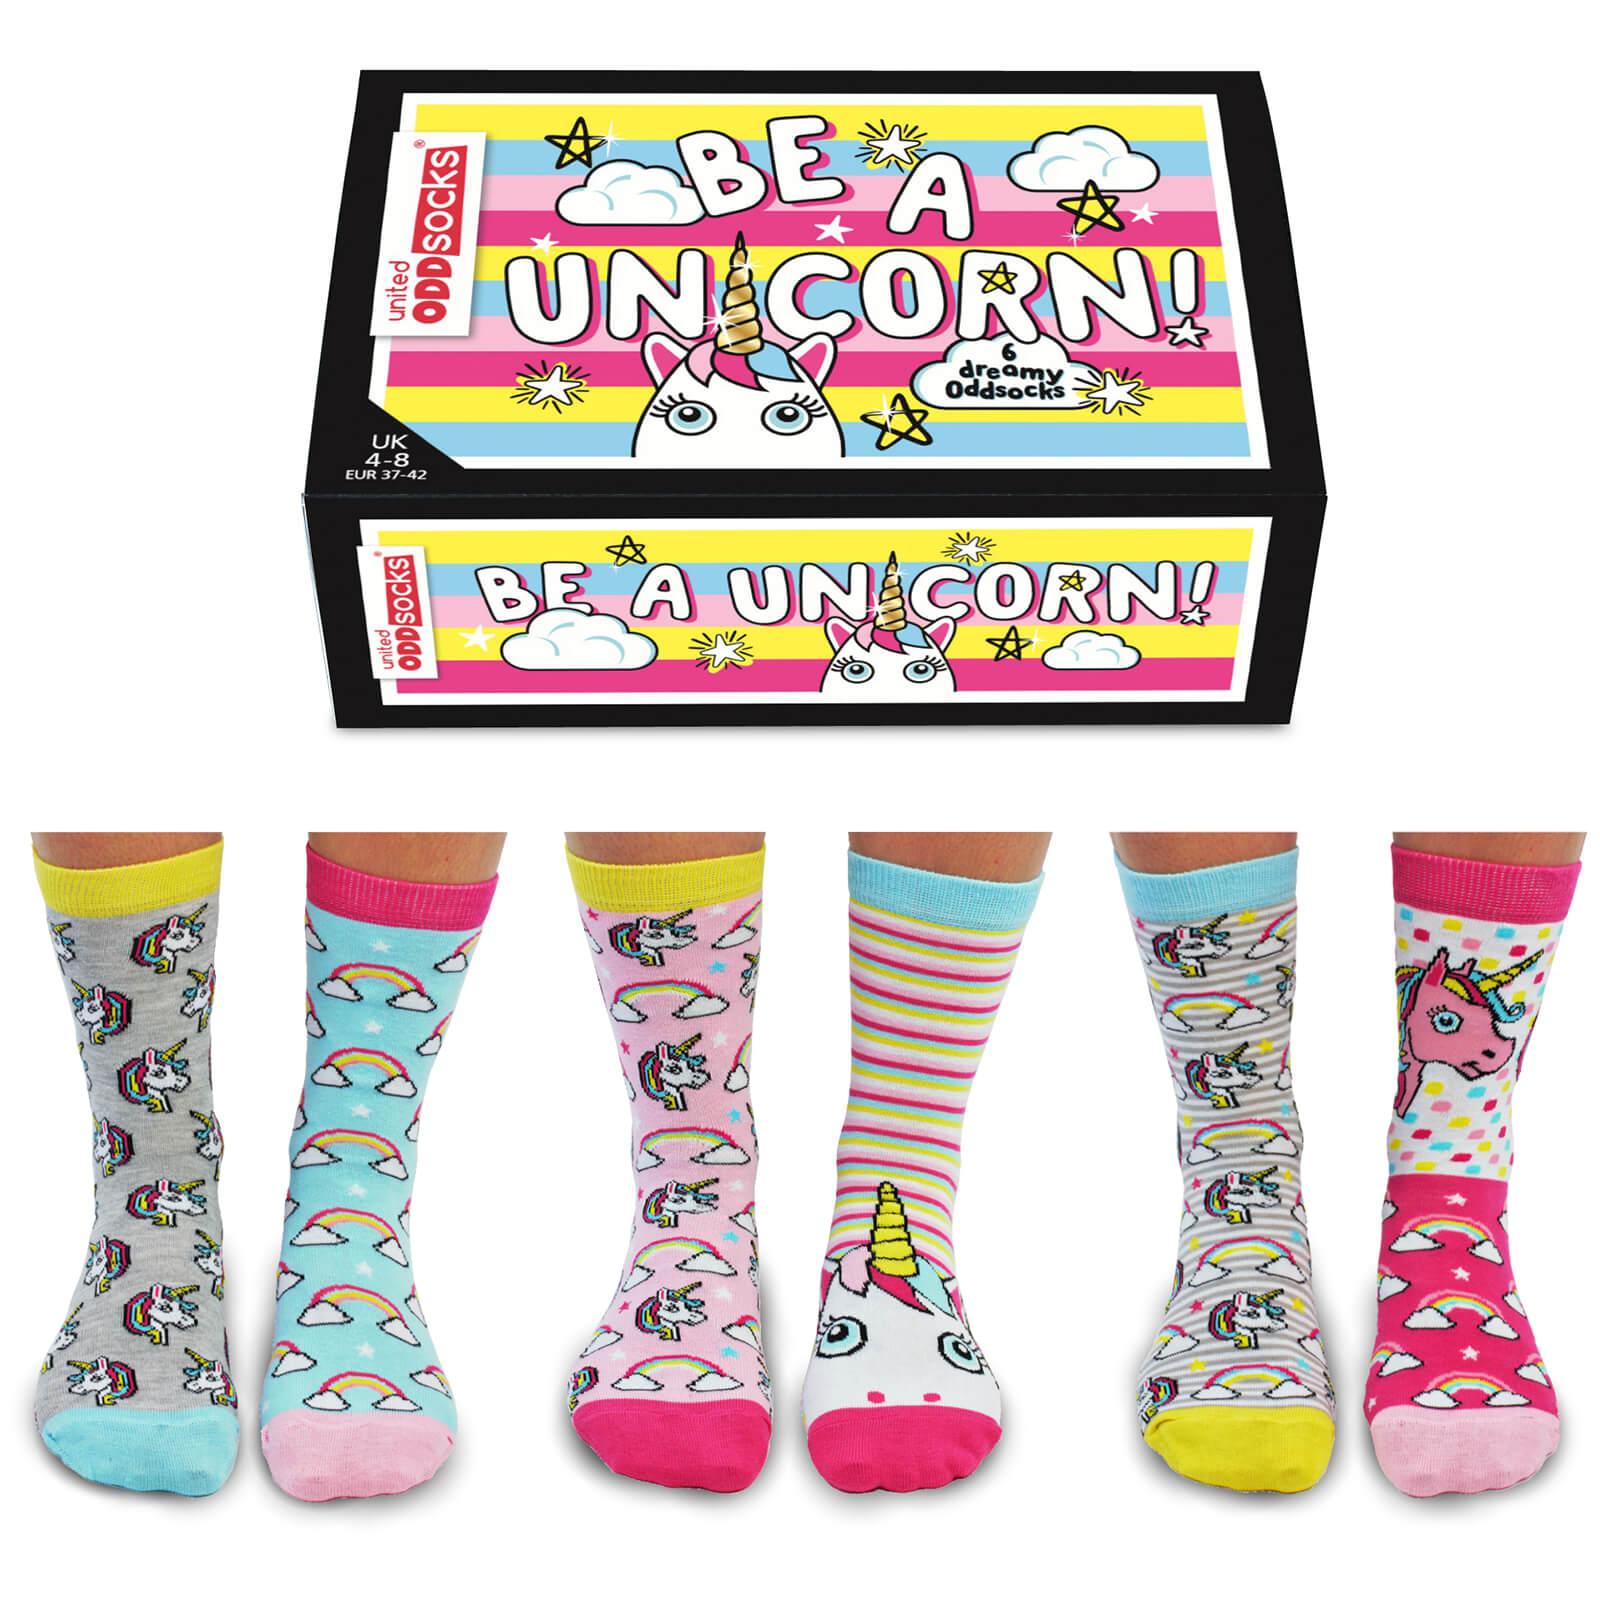 United Oddsocks Women's Be a Unicorn Socks Gift Set-female